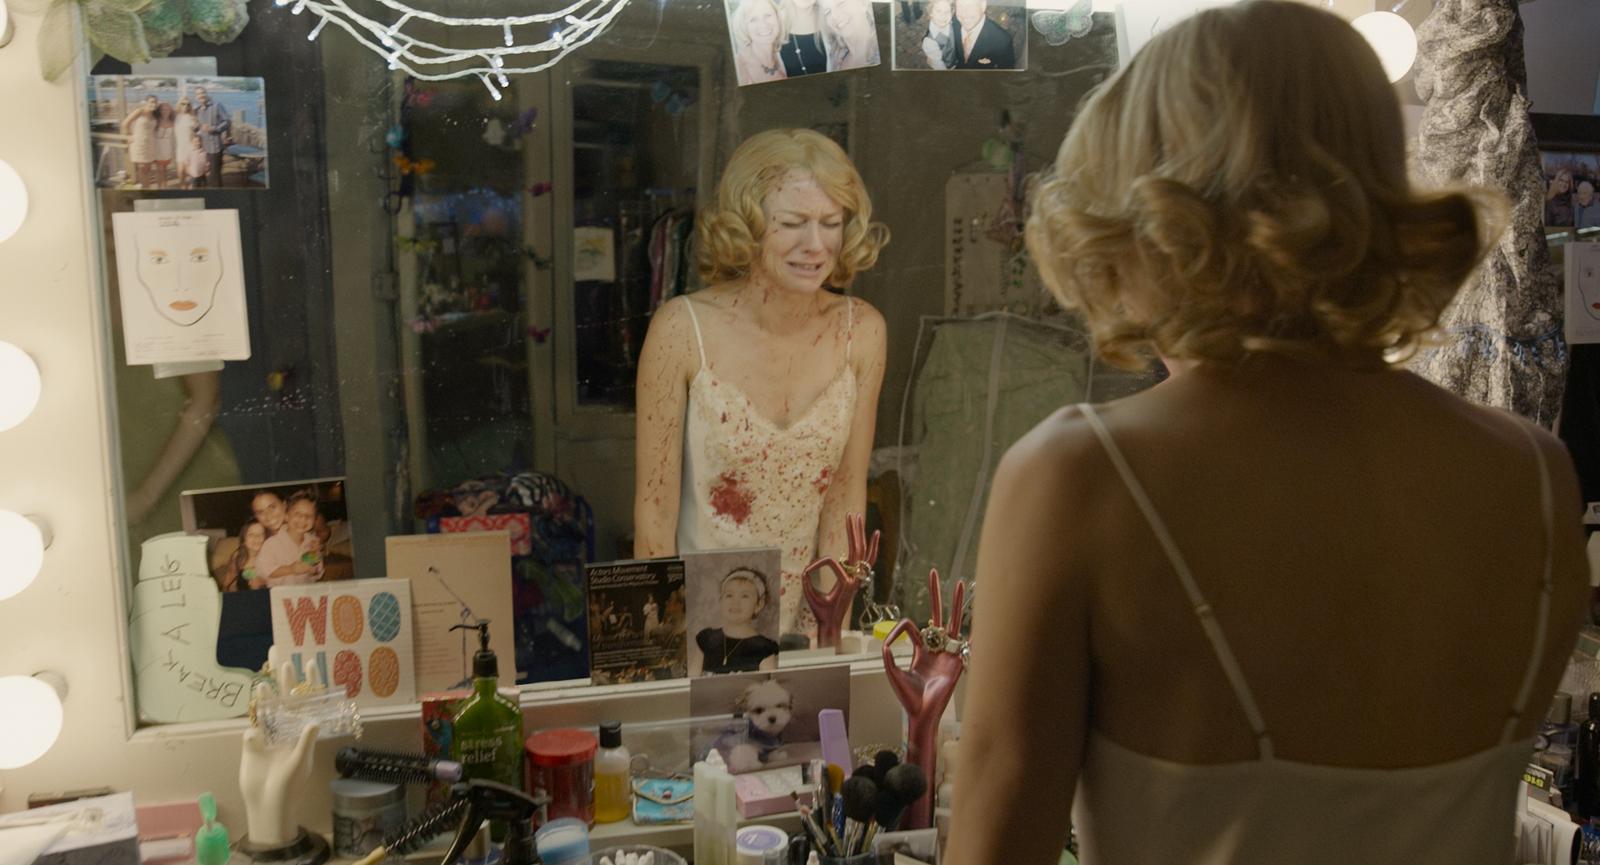 Naomi Watts. Birdman. Le ciné d'Alain